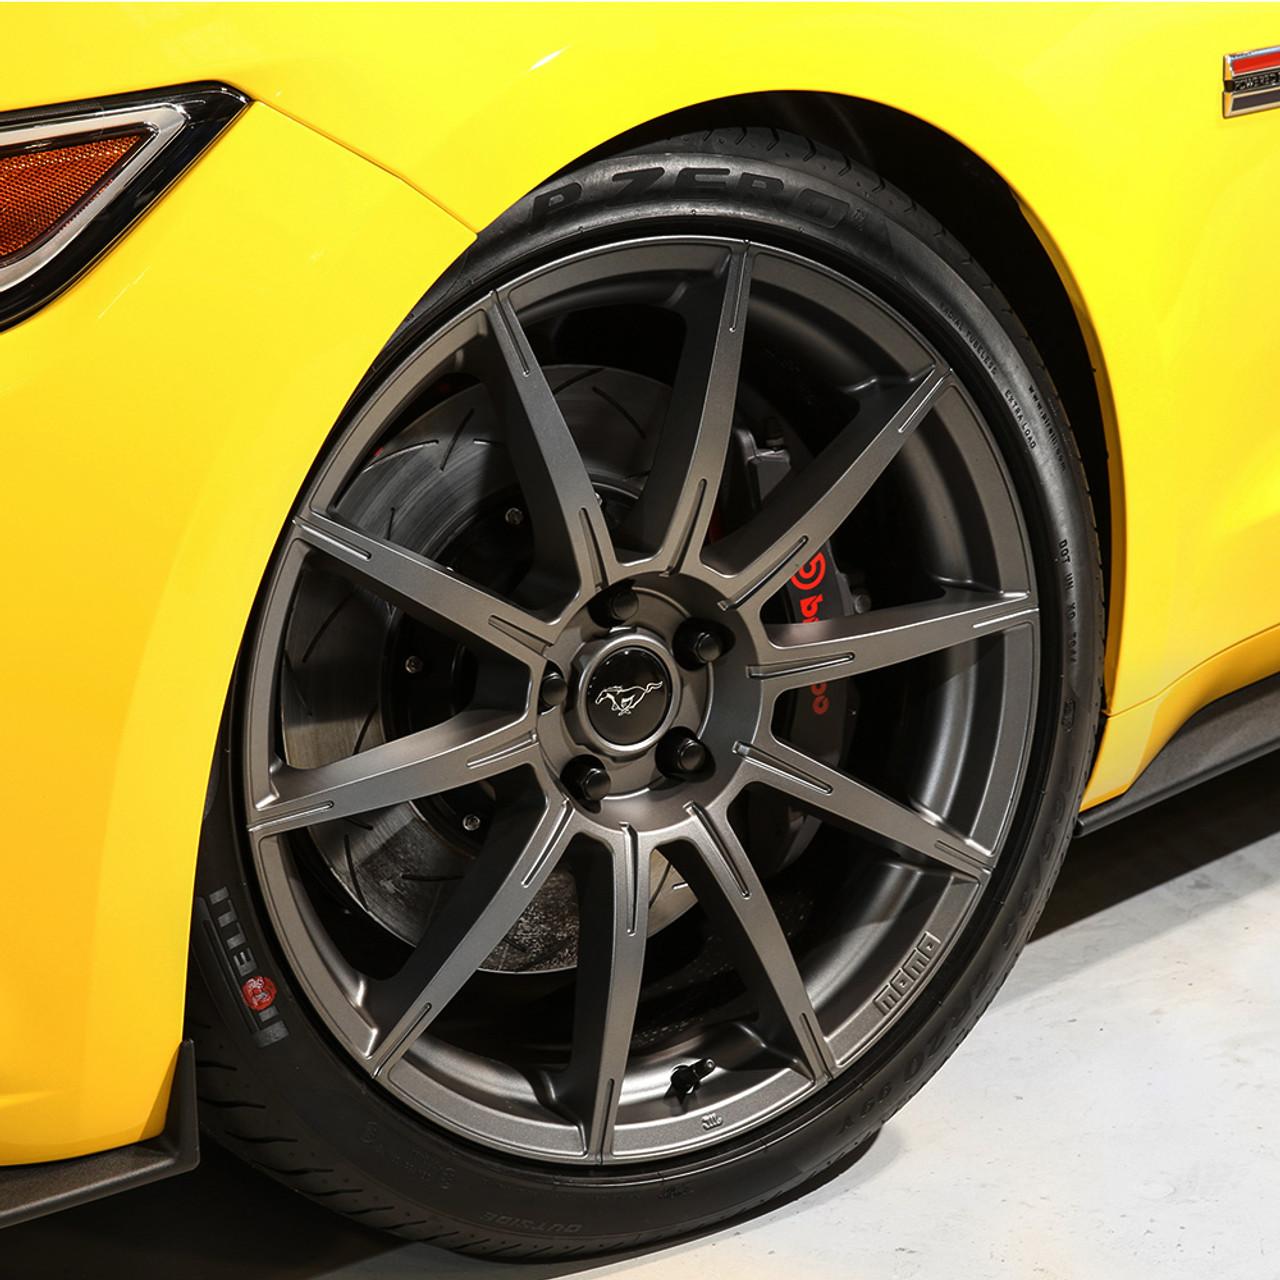 2015 Mustang Wheels >> 2015 2017 Mustang Herrod Momo Pony Wheels With Tyres